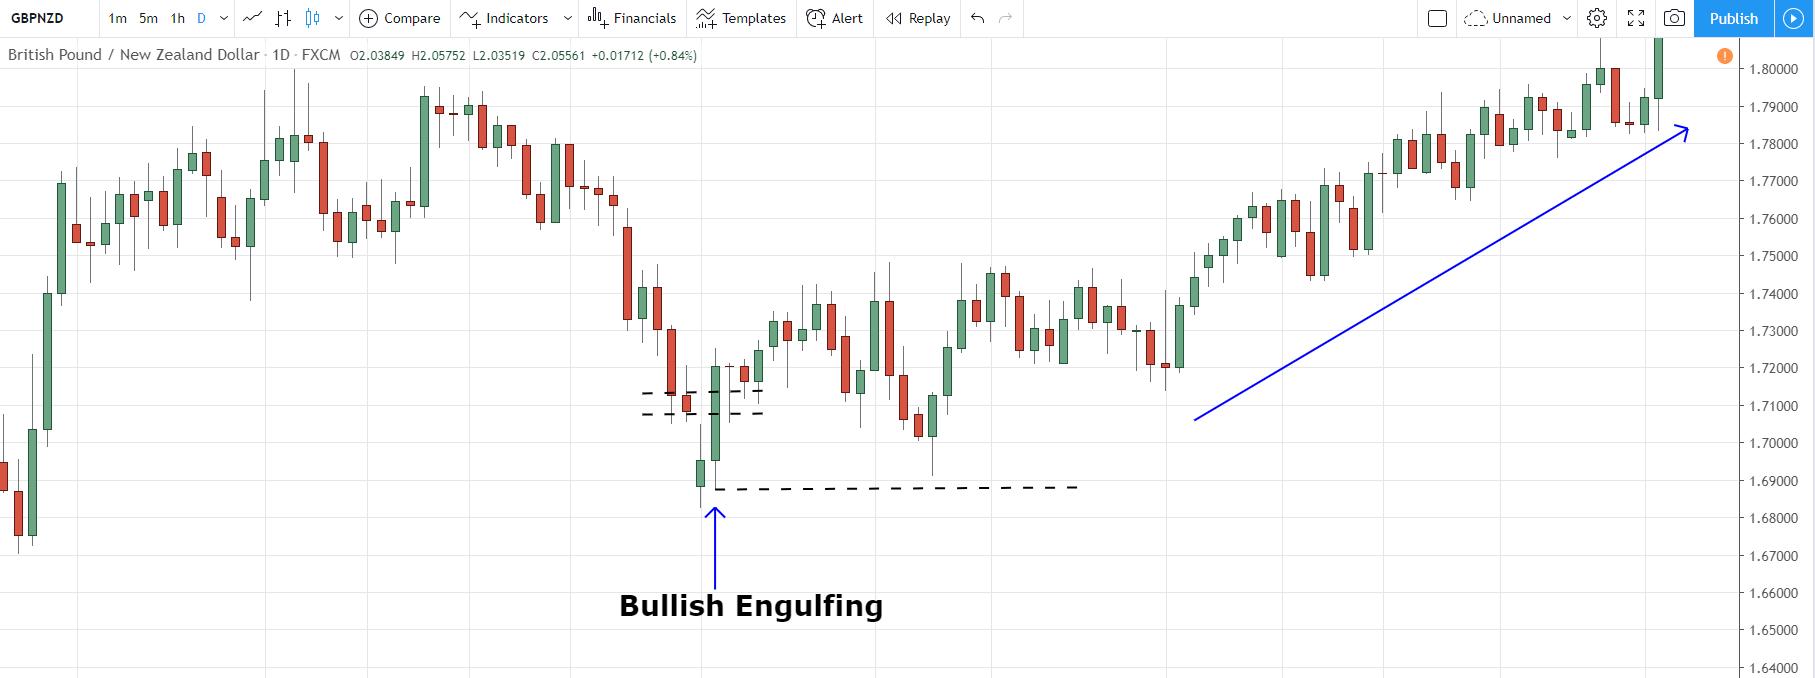 Bullish Engulfing GBPNZD Pattern